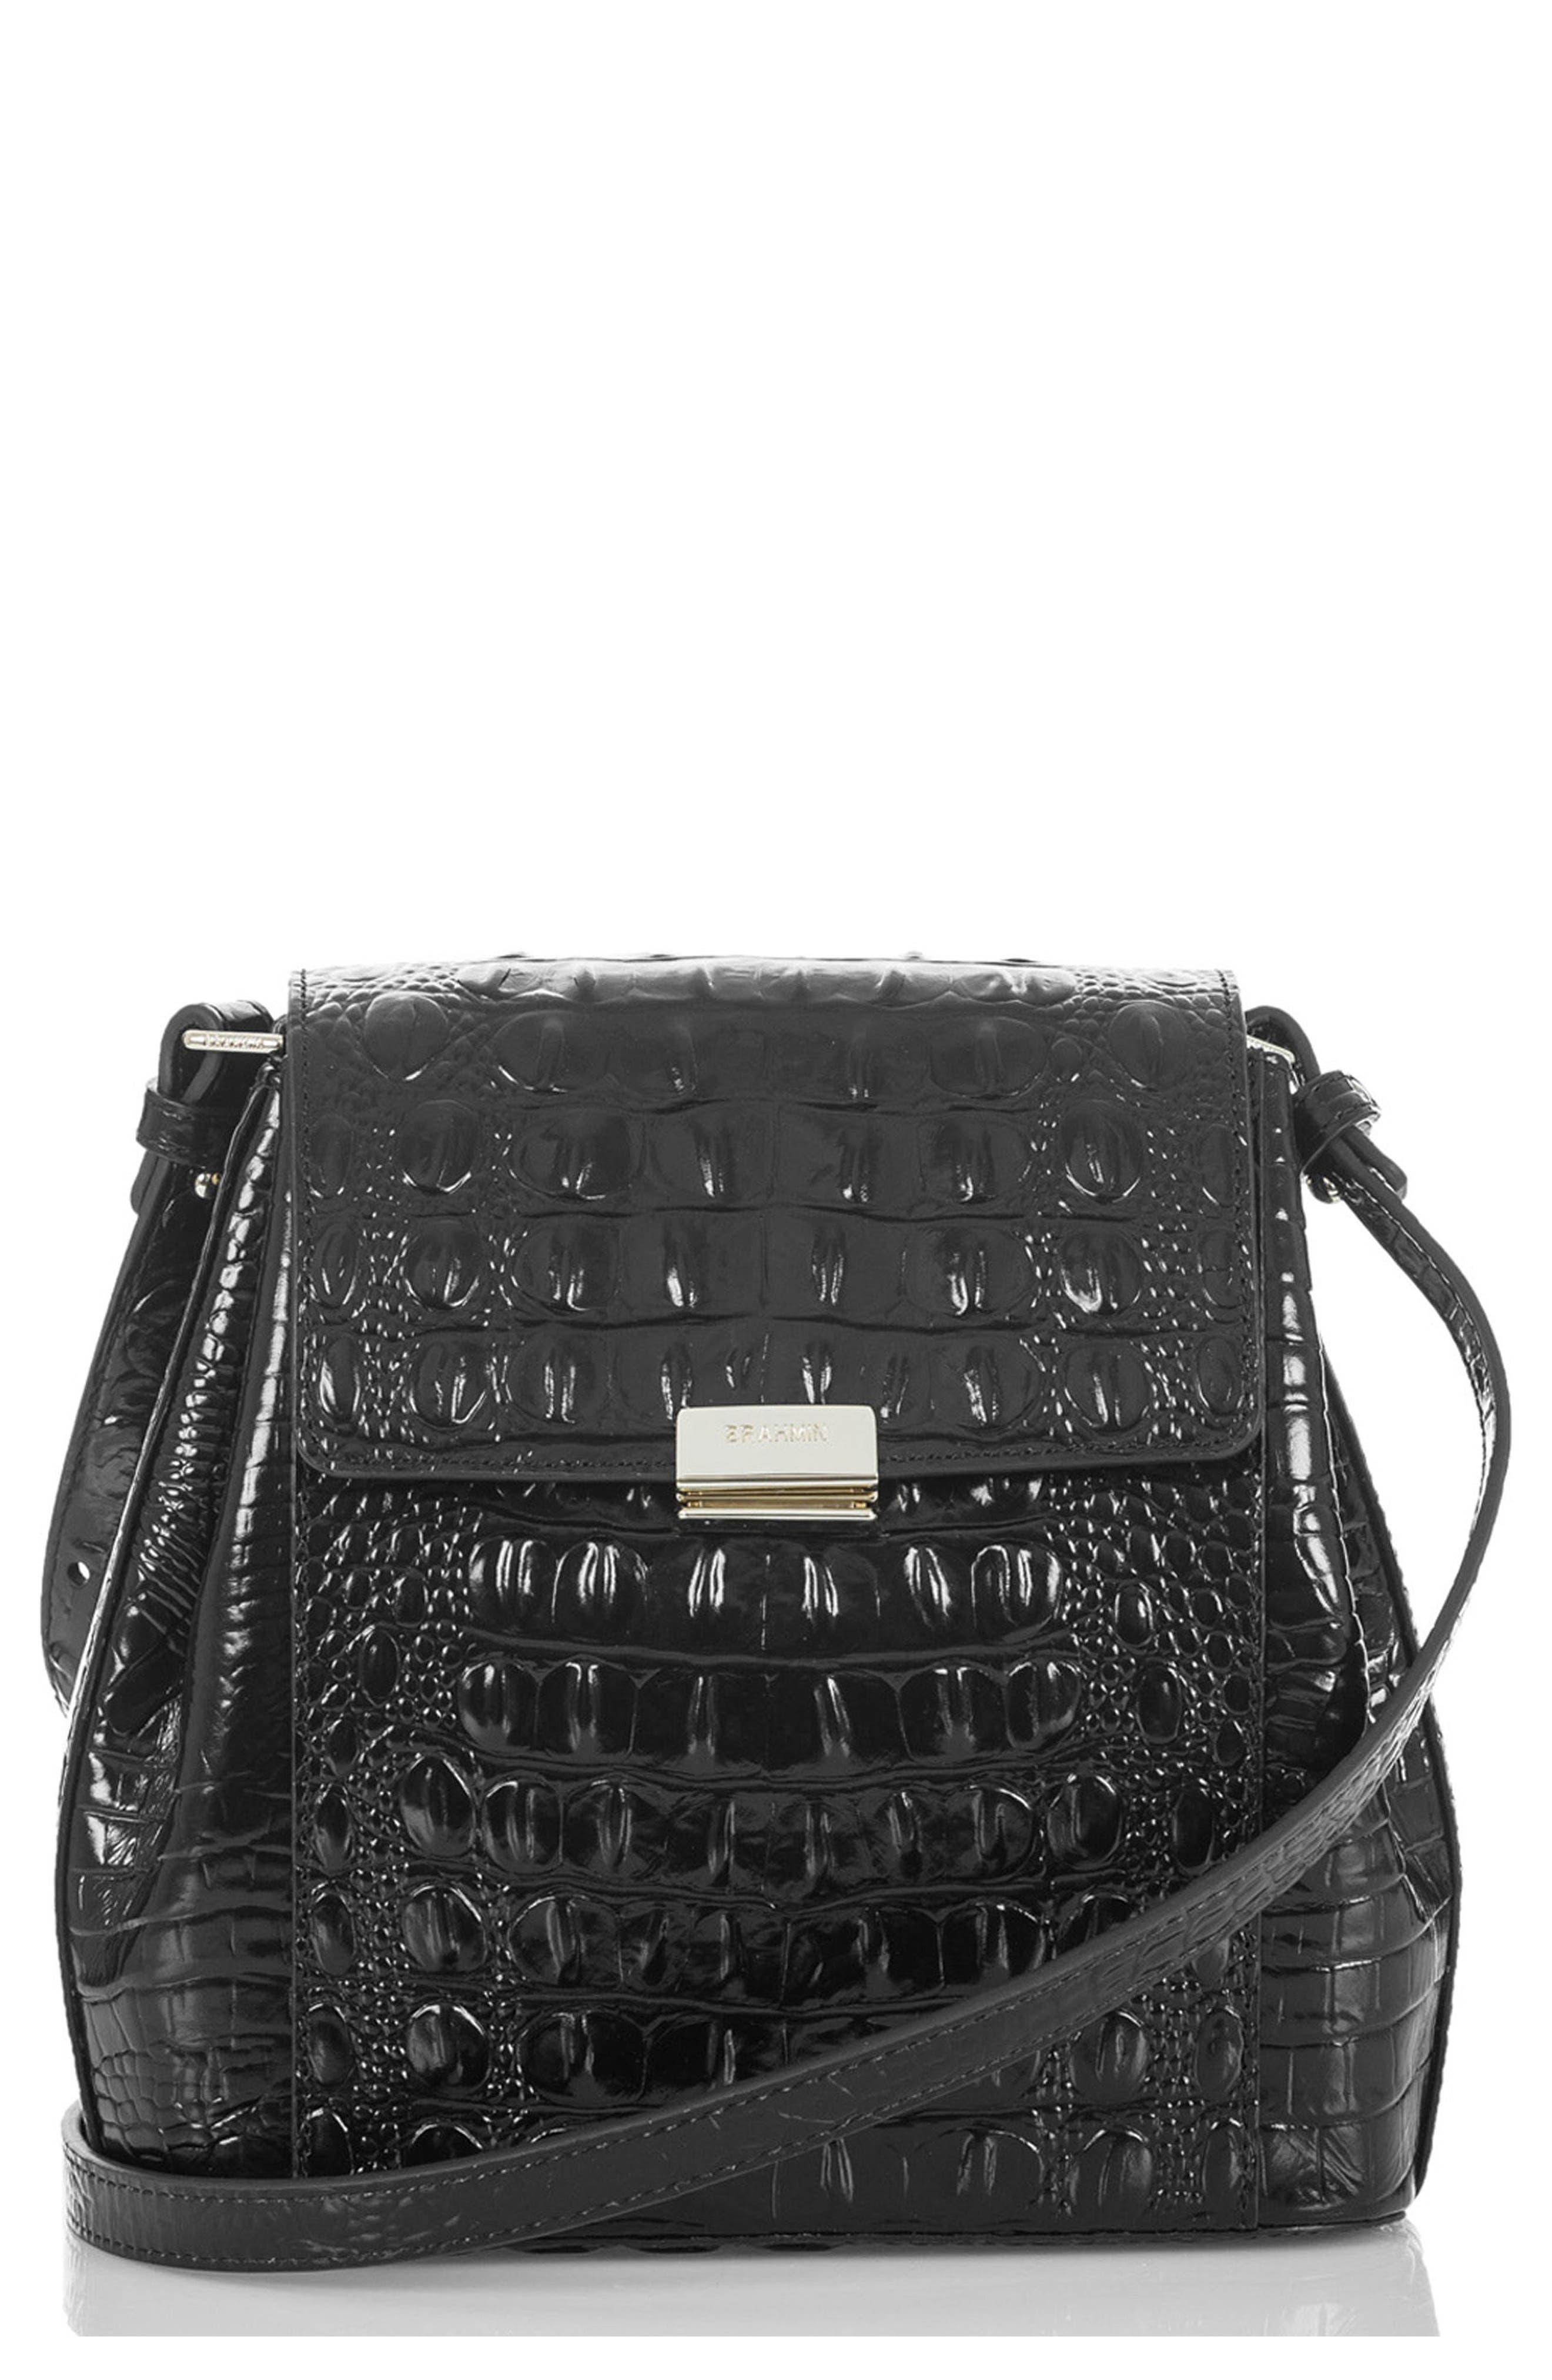 Margo Croc Embossed Leather Crossbody Bag,                         Main,                         color, BLACK